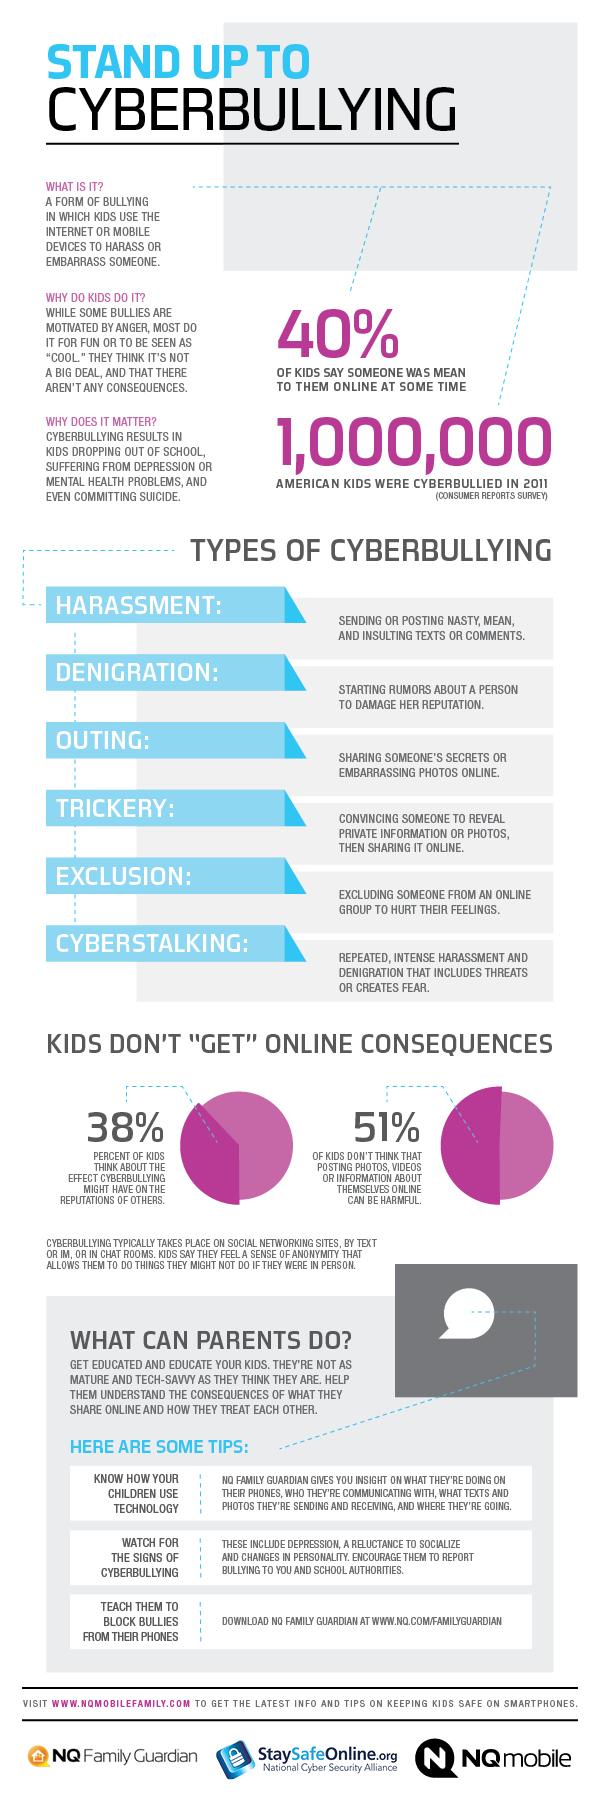 21 Provocative Cyberstalking Statistics - BrandonGaille.com